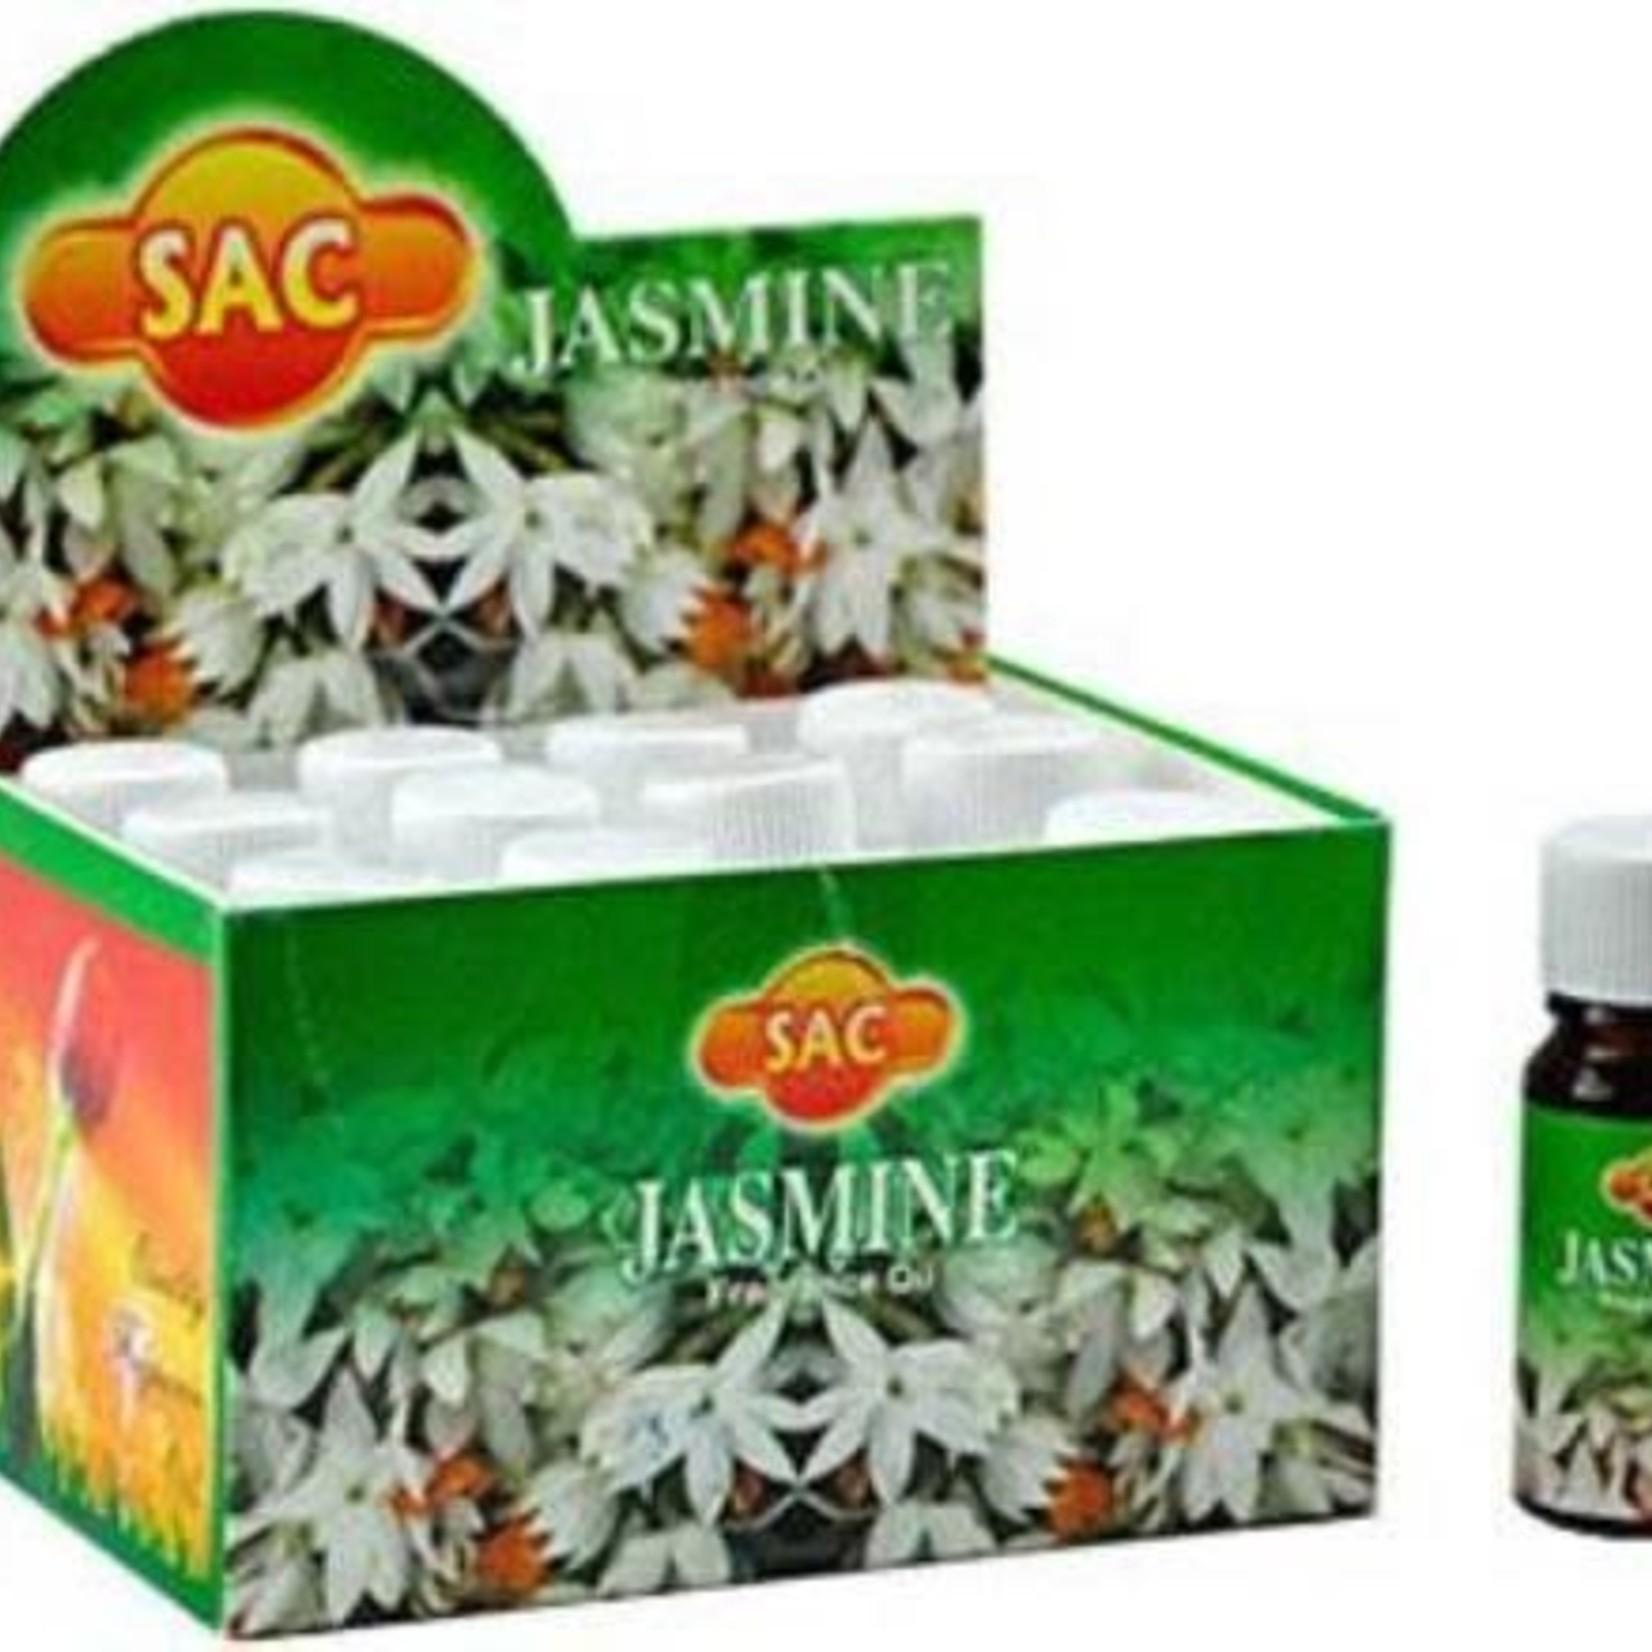 Jasmine Fragrance Oil - SAC